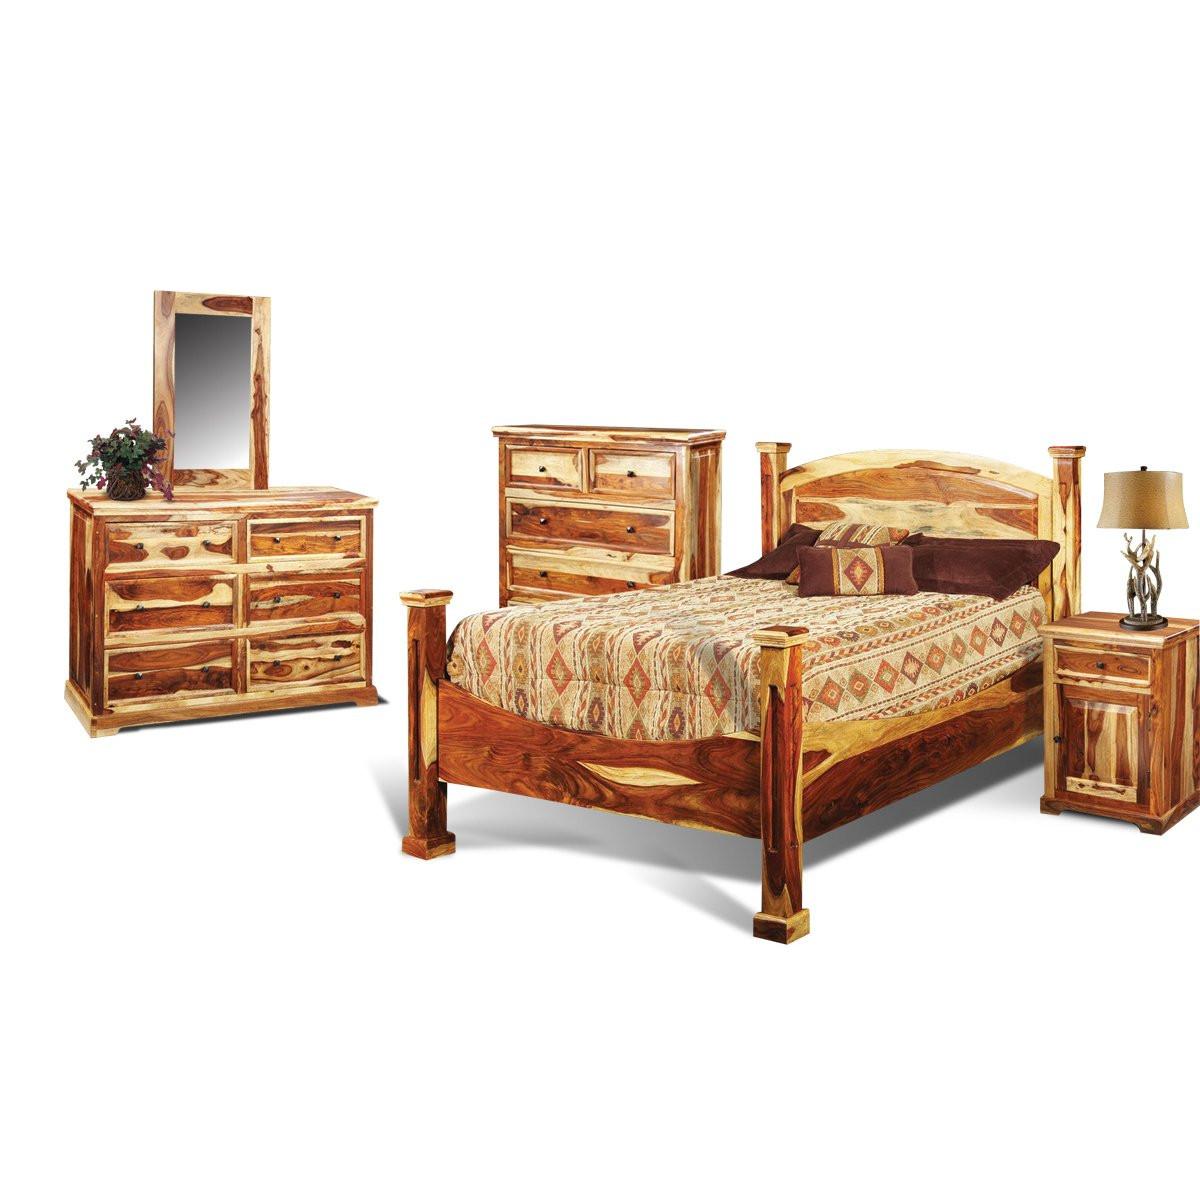 Rustic Bedroom Set King  Tahoe Pine Rustic 6 Piece King Bedroom Set